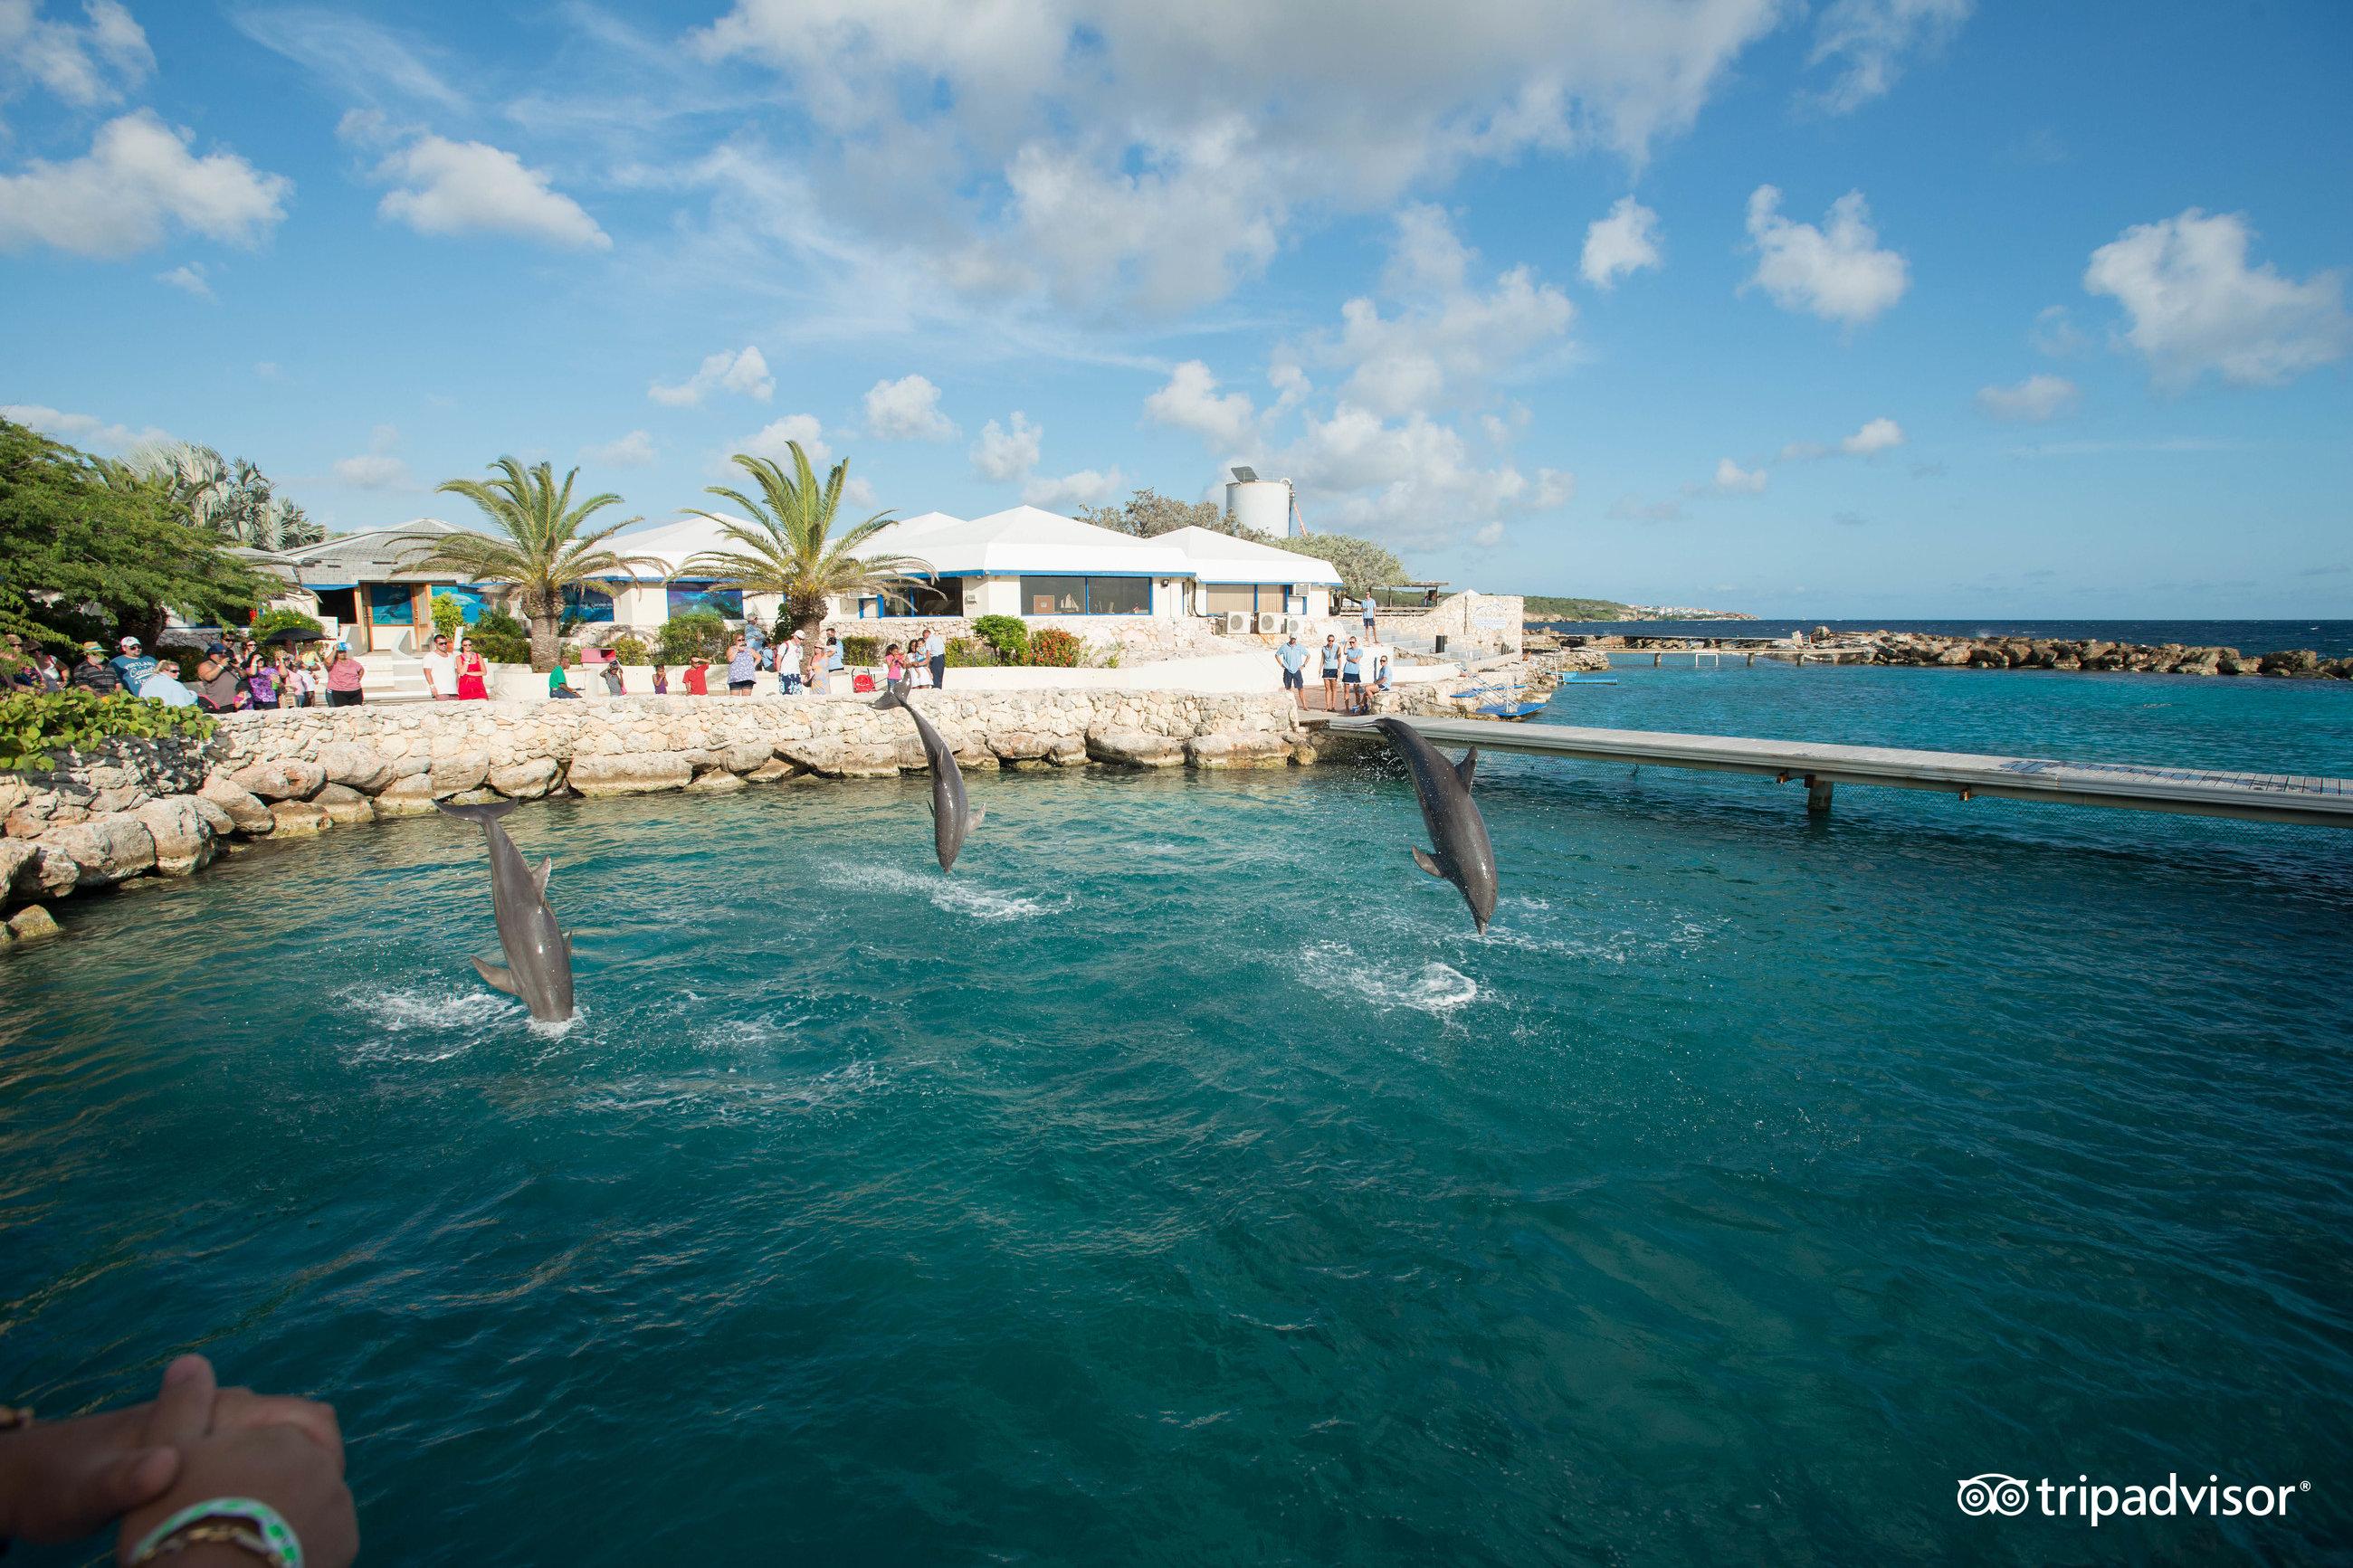 The Royal Sea Aquarium Resort Willemstad 2018 Review